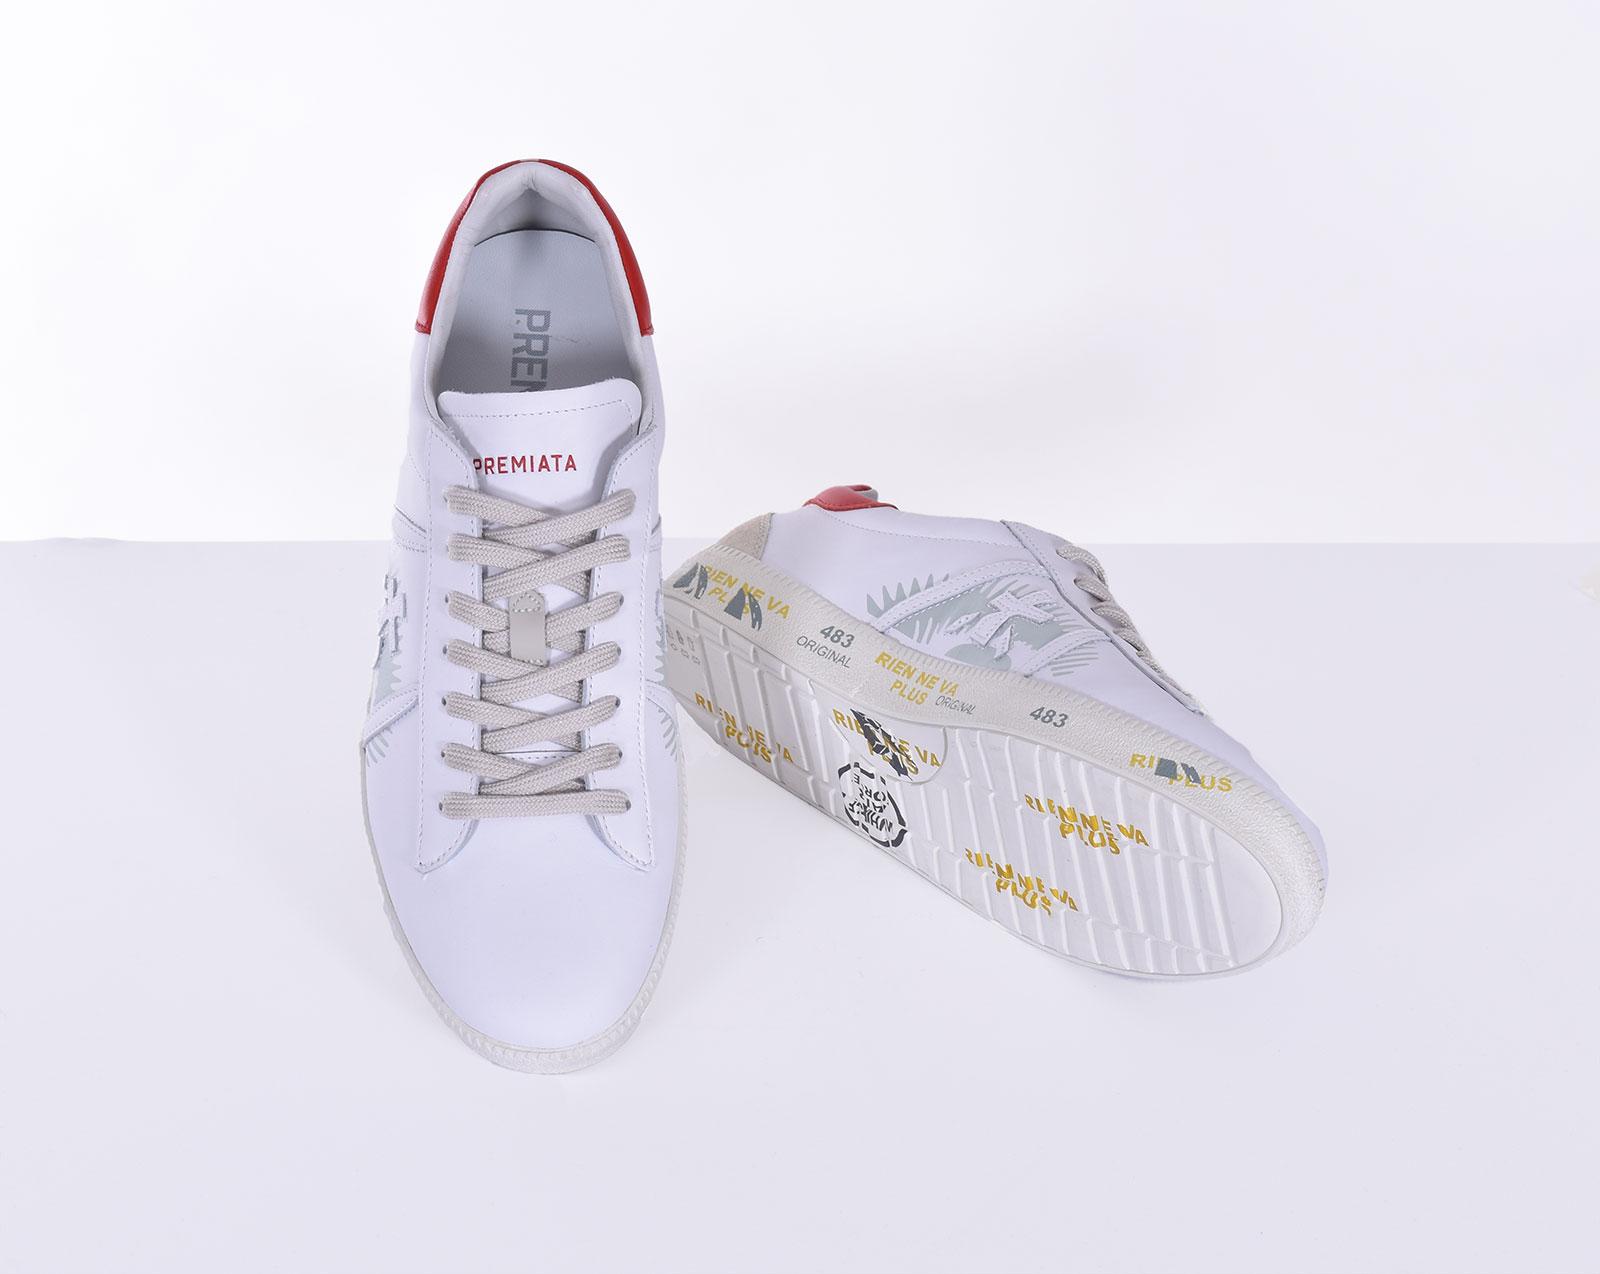 Sneakers shoes Premiata Andy 5144 PREMIATA | ANDY5144